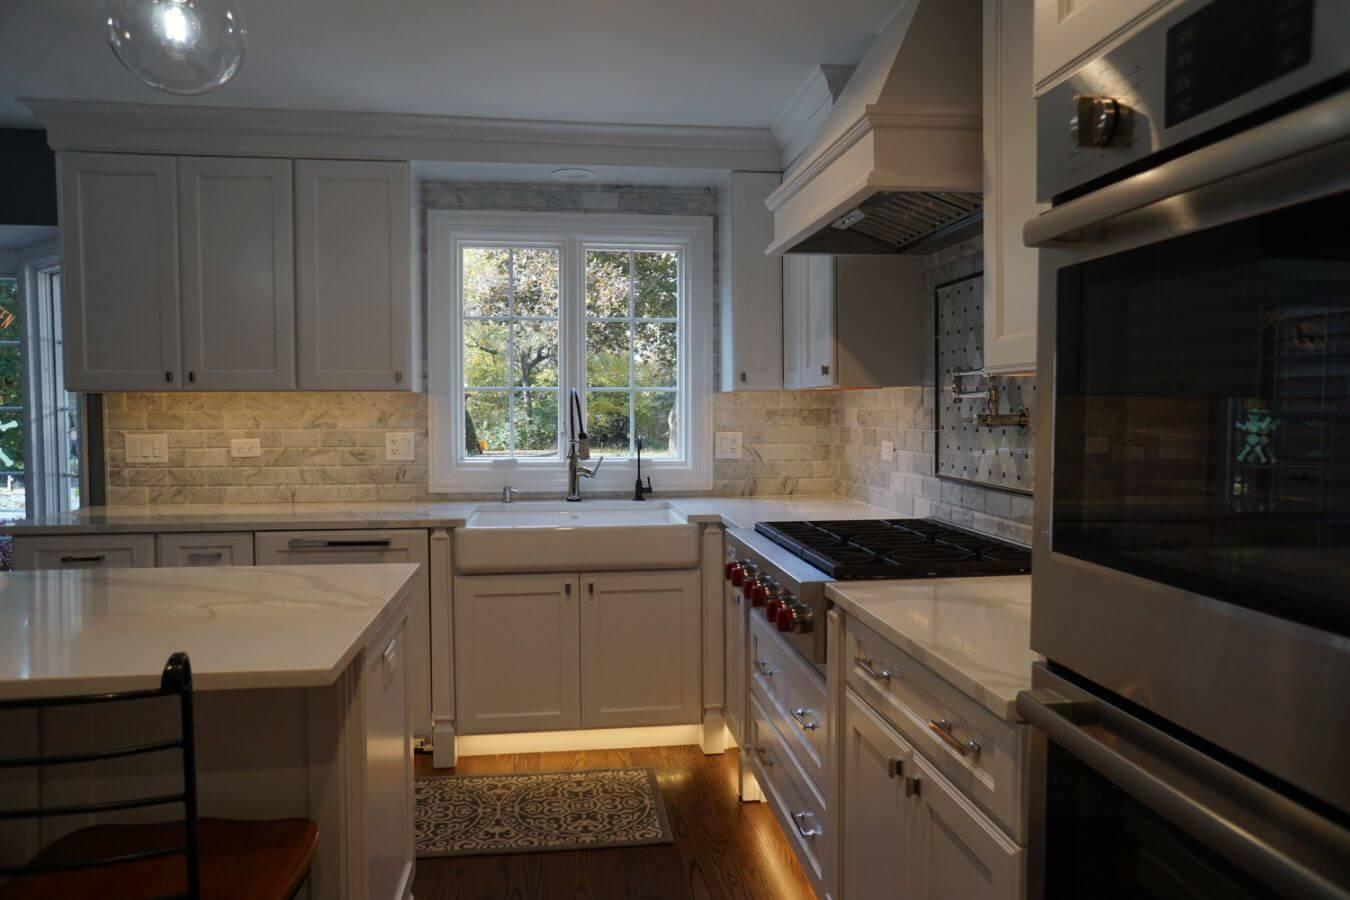 Kitchen Remodel Company Arlington Heights IL